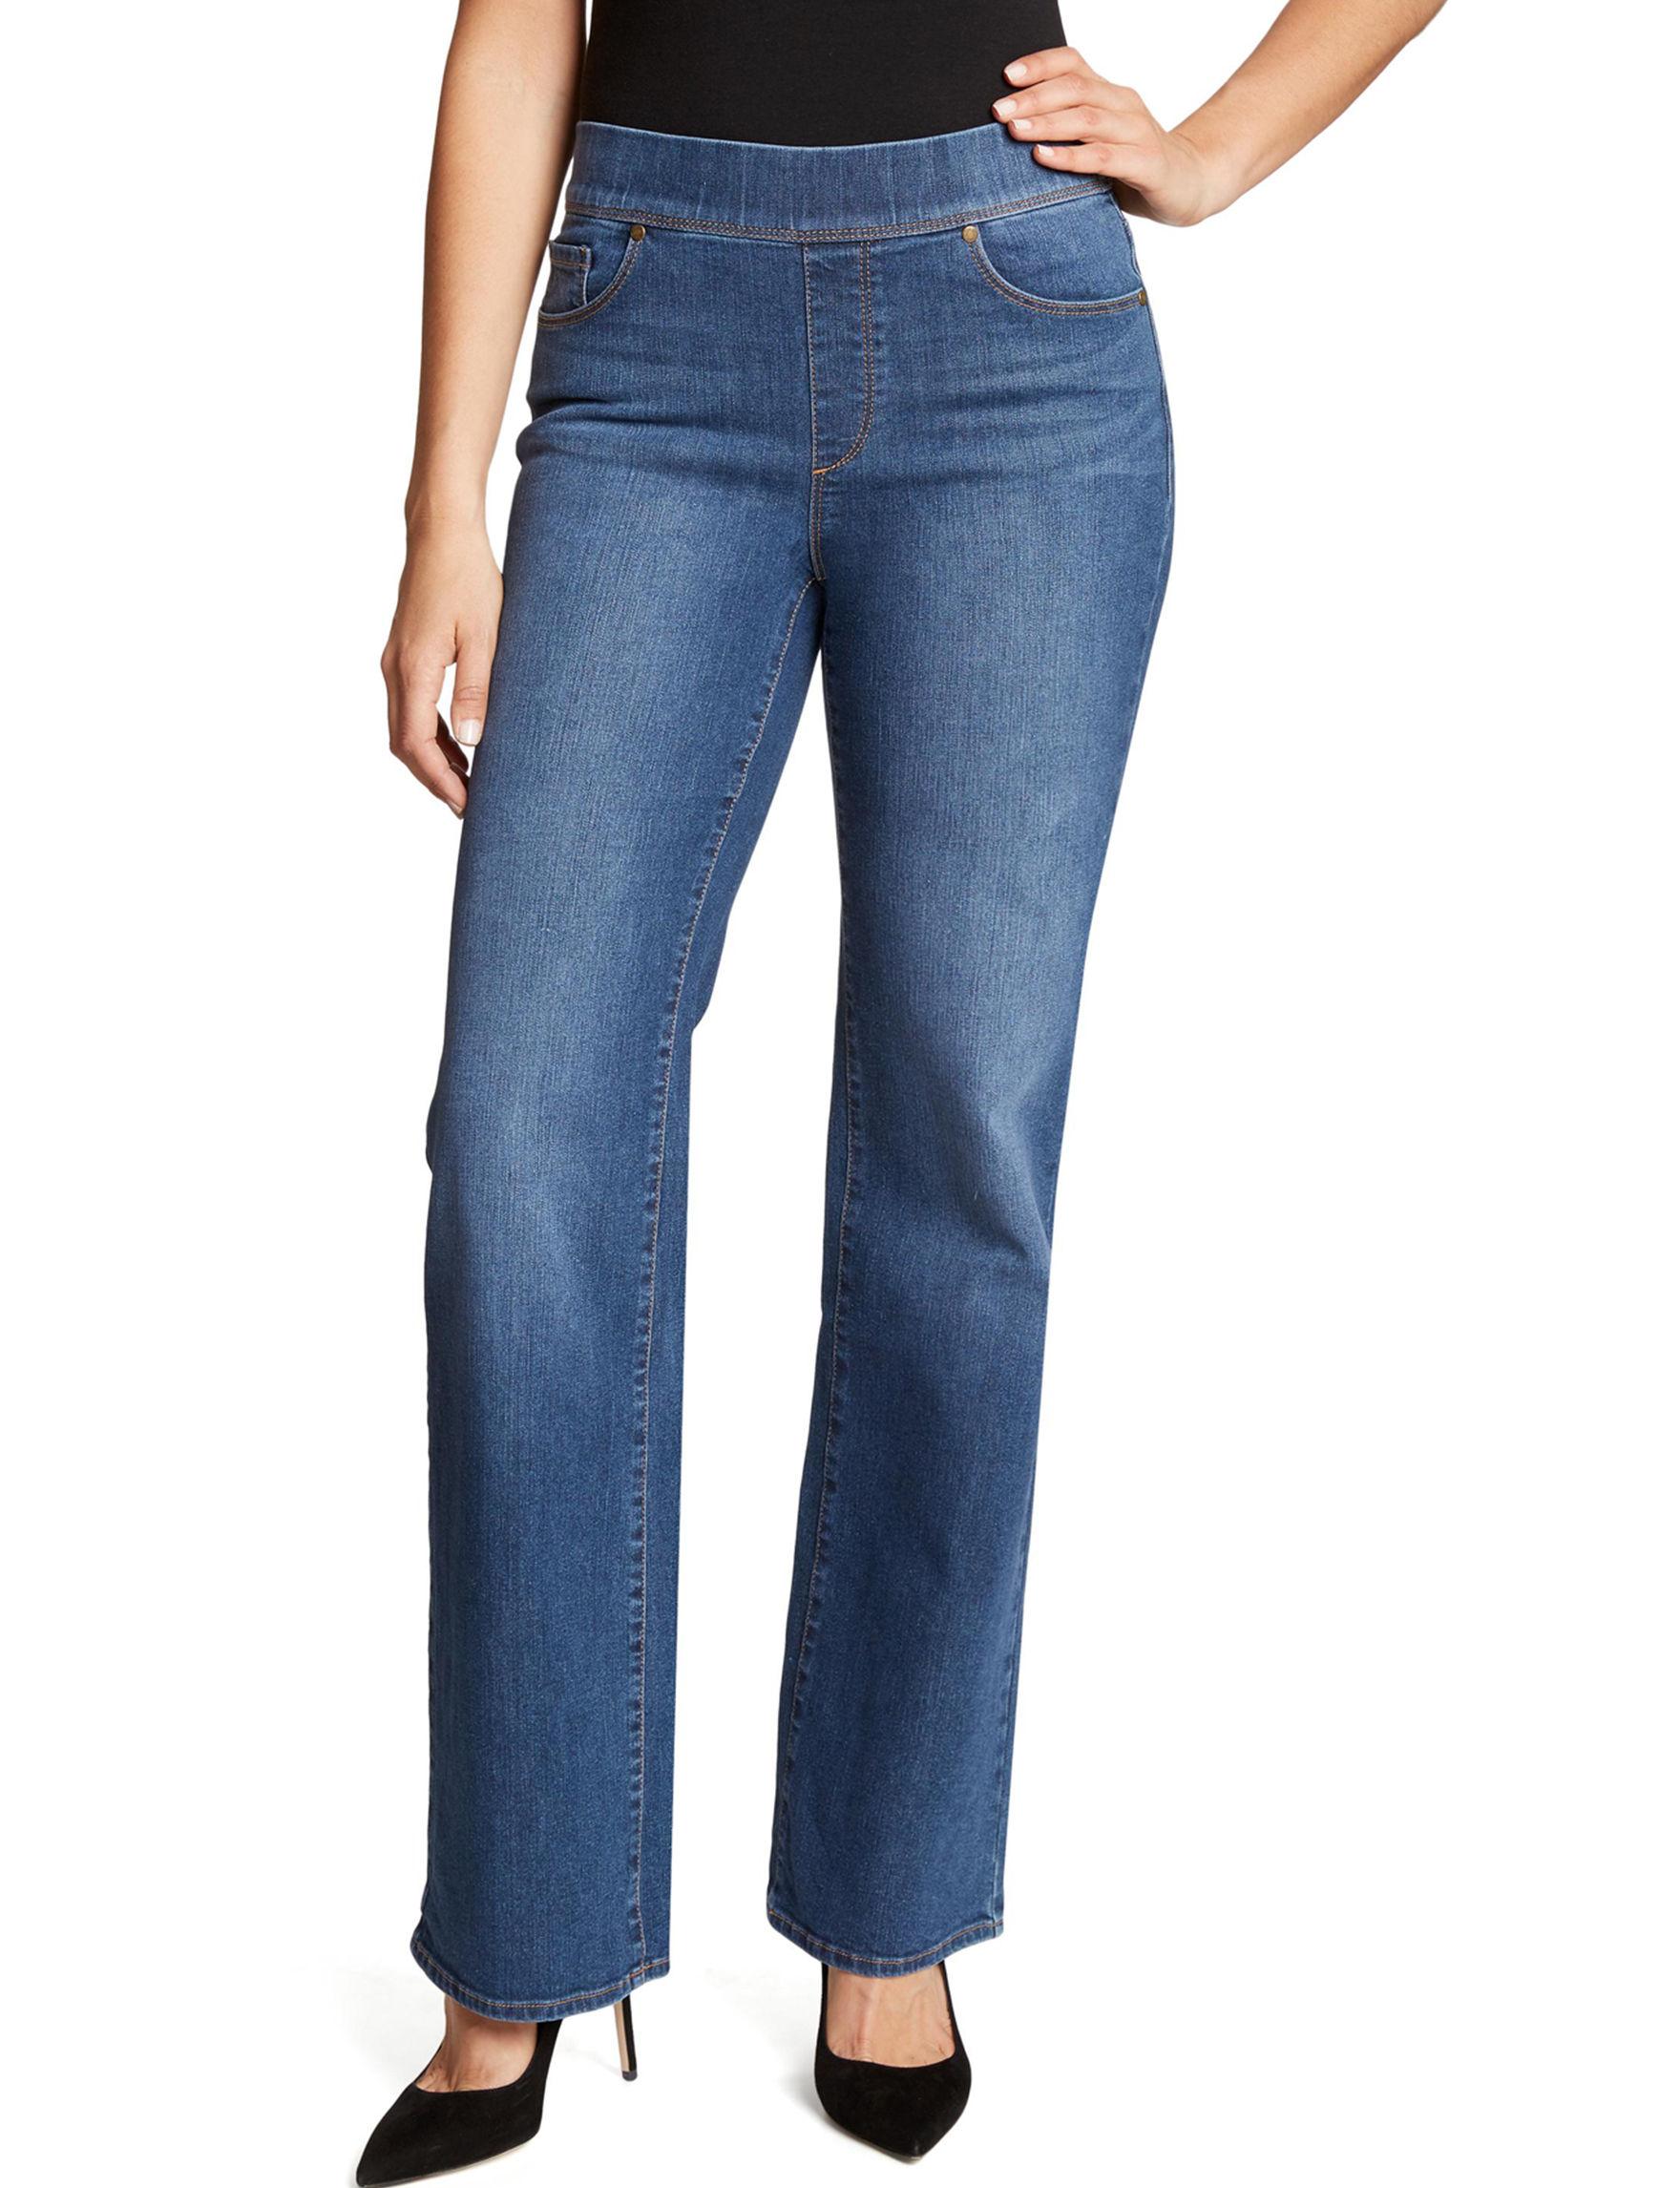 Gloria Vanderbilt Blue Wide Leg